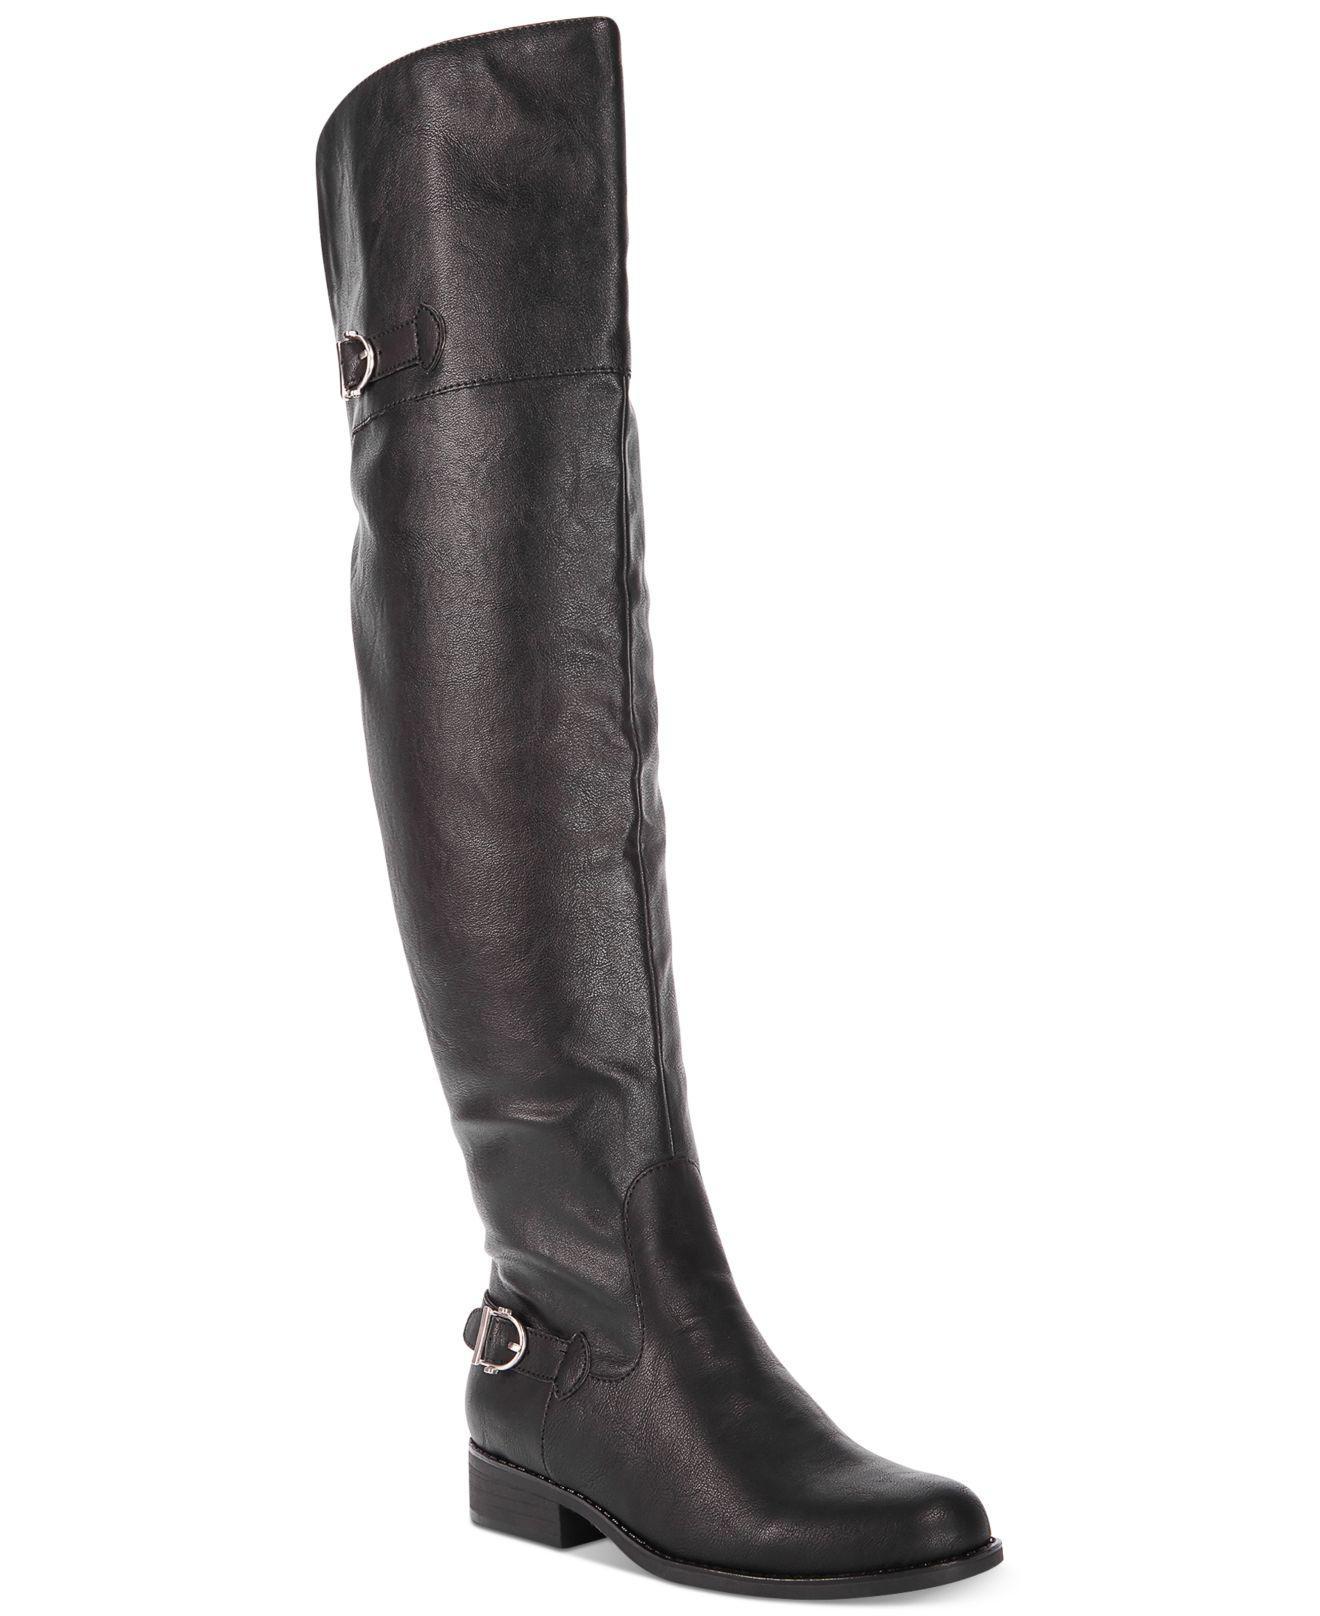 06c1d4e30a19 Lyst - American Rag Adarra Wide-calf Tall Buckle Boots in Black